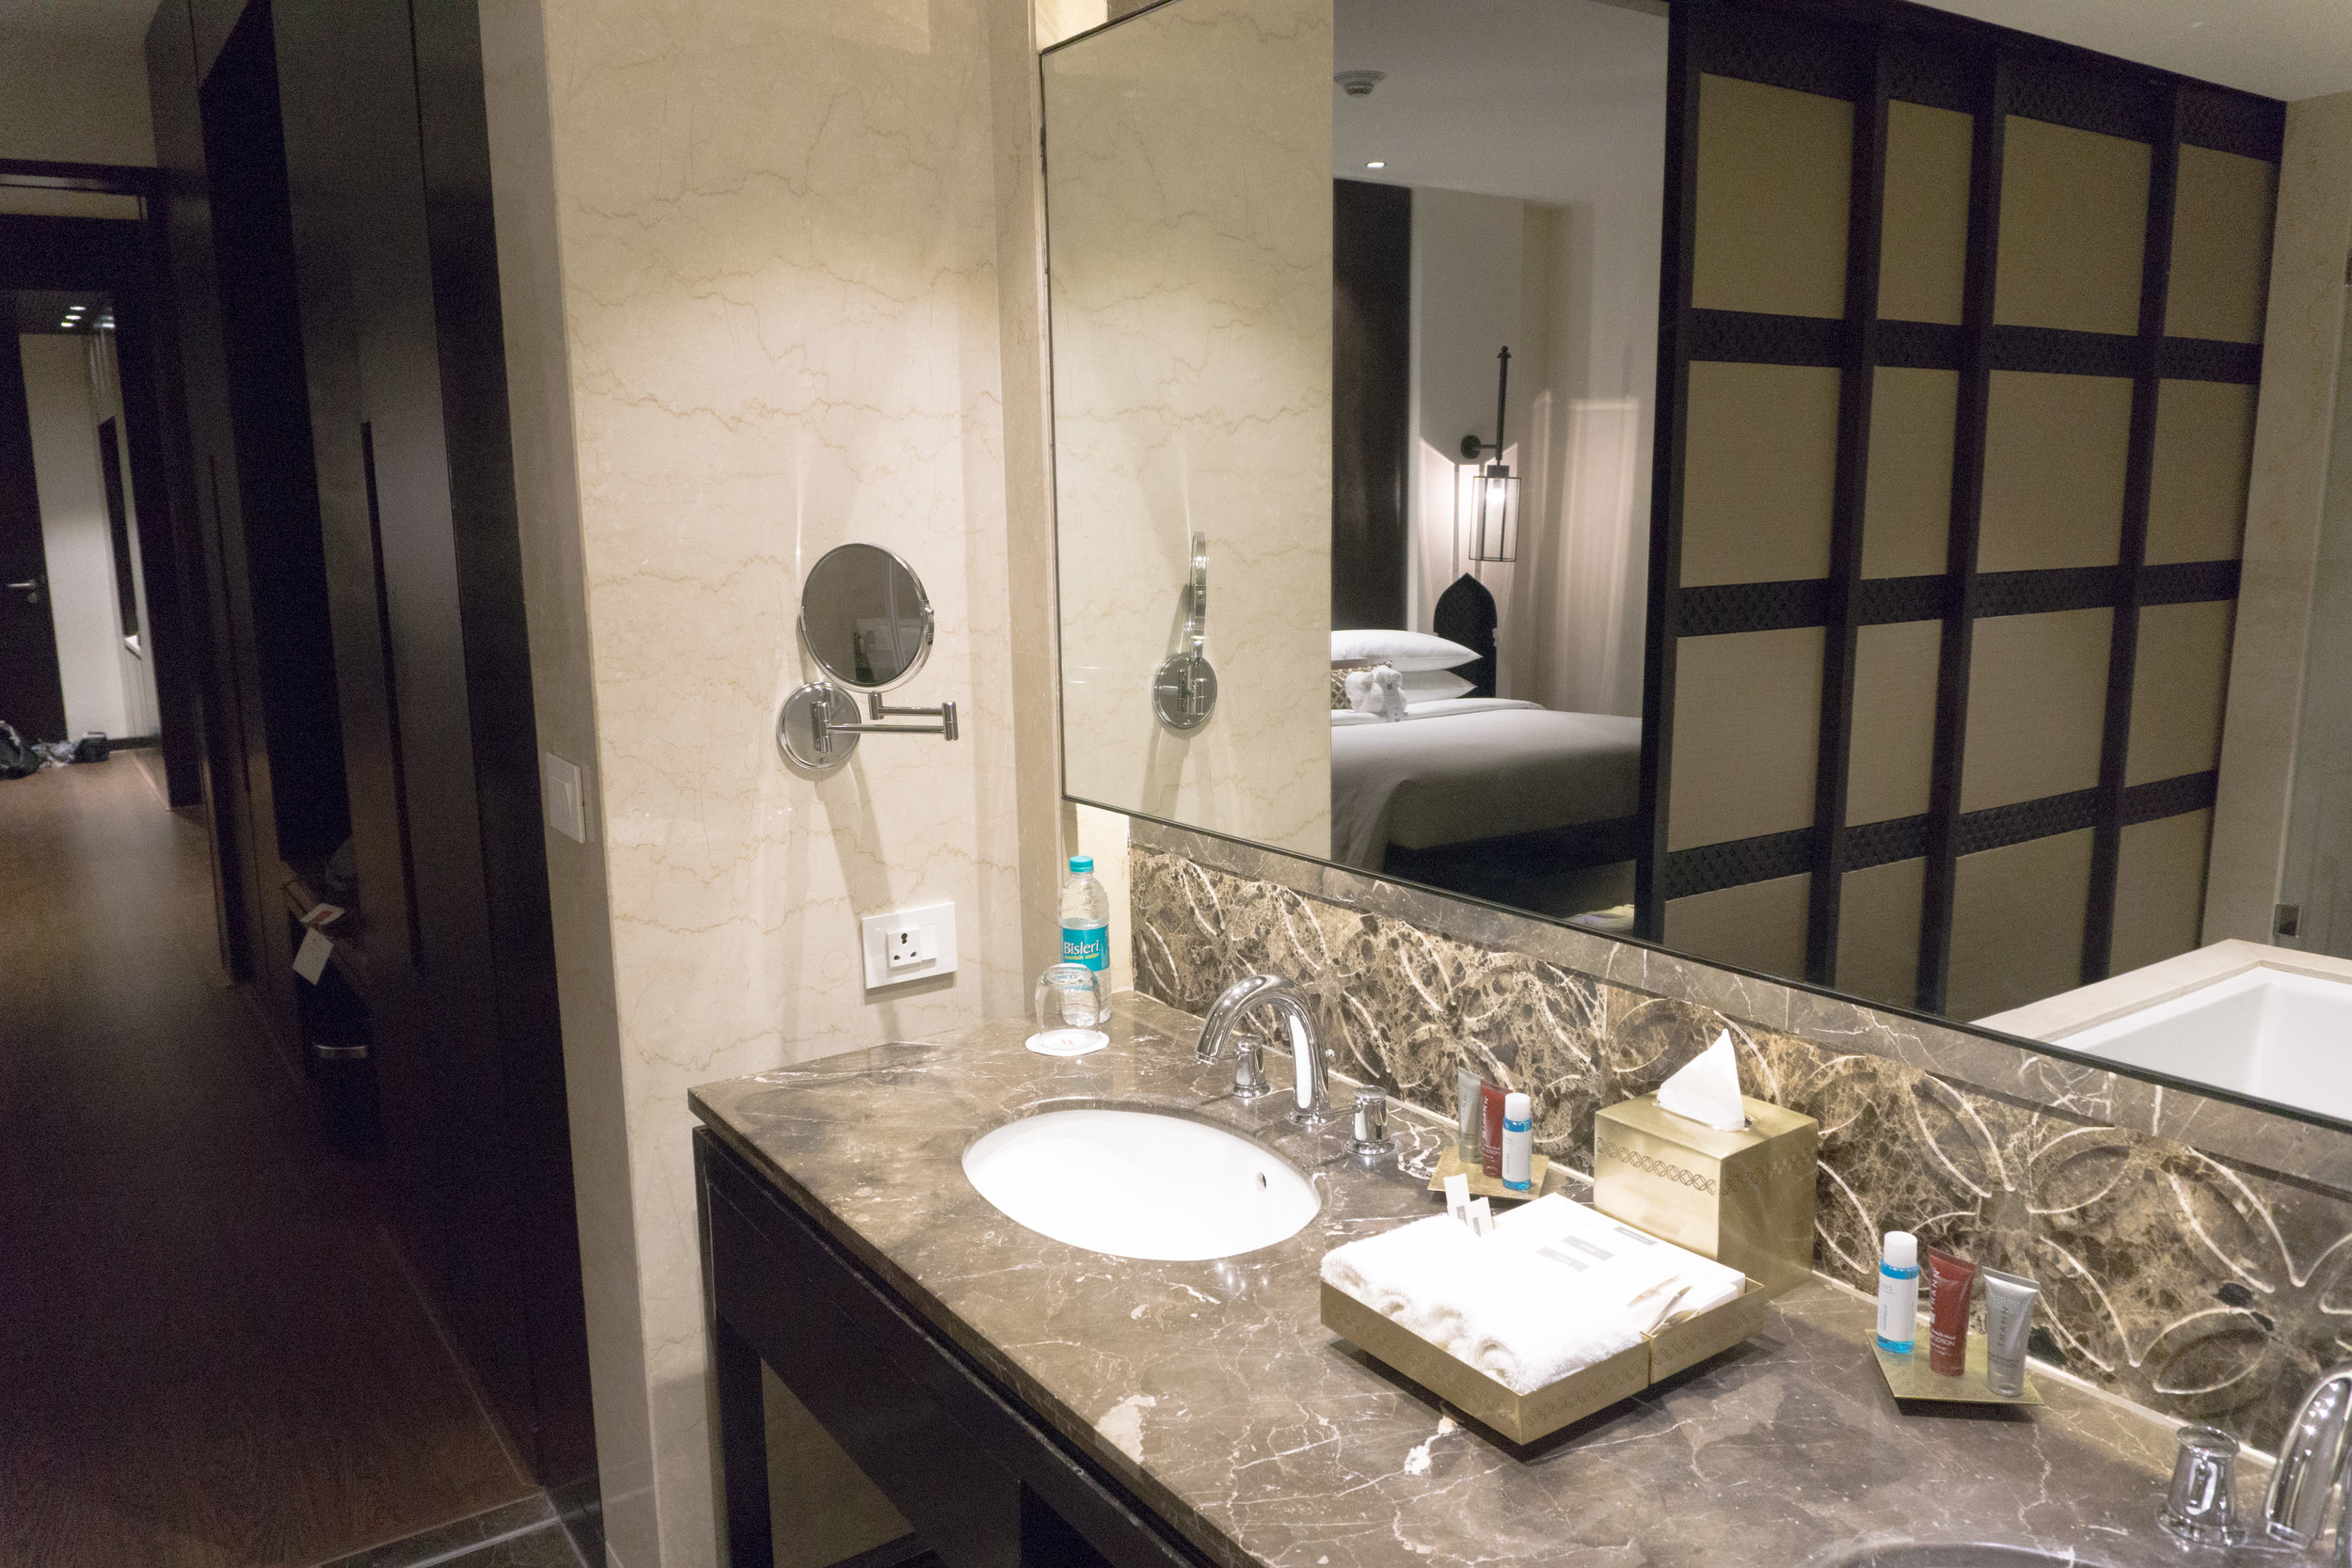 Bathroom counters